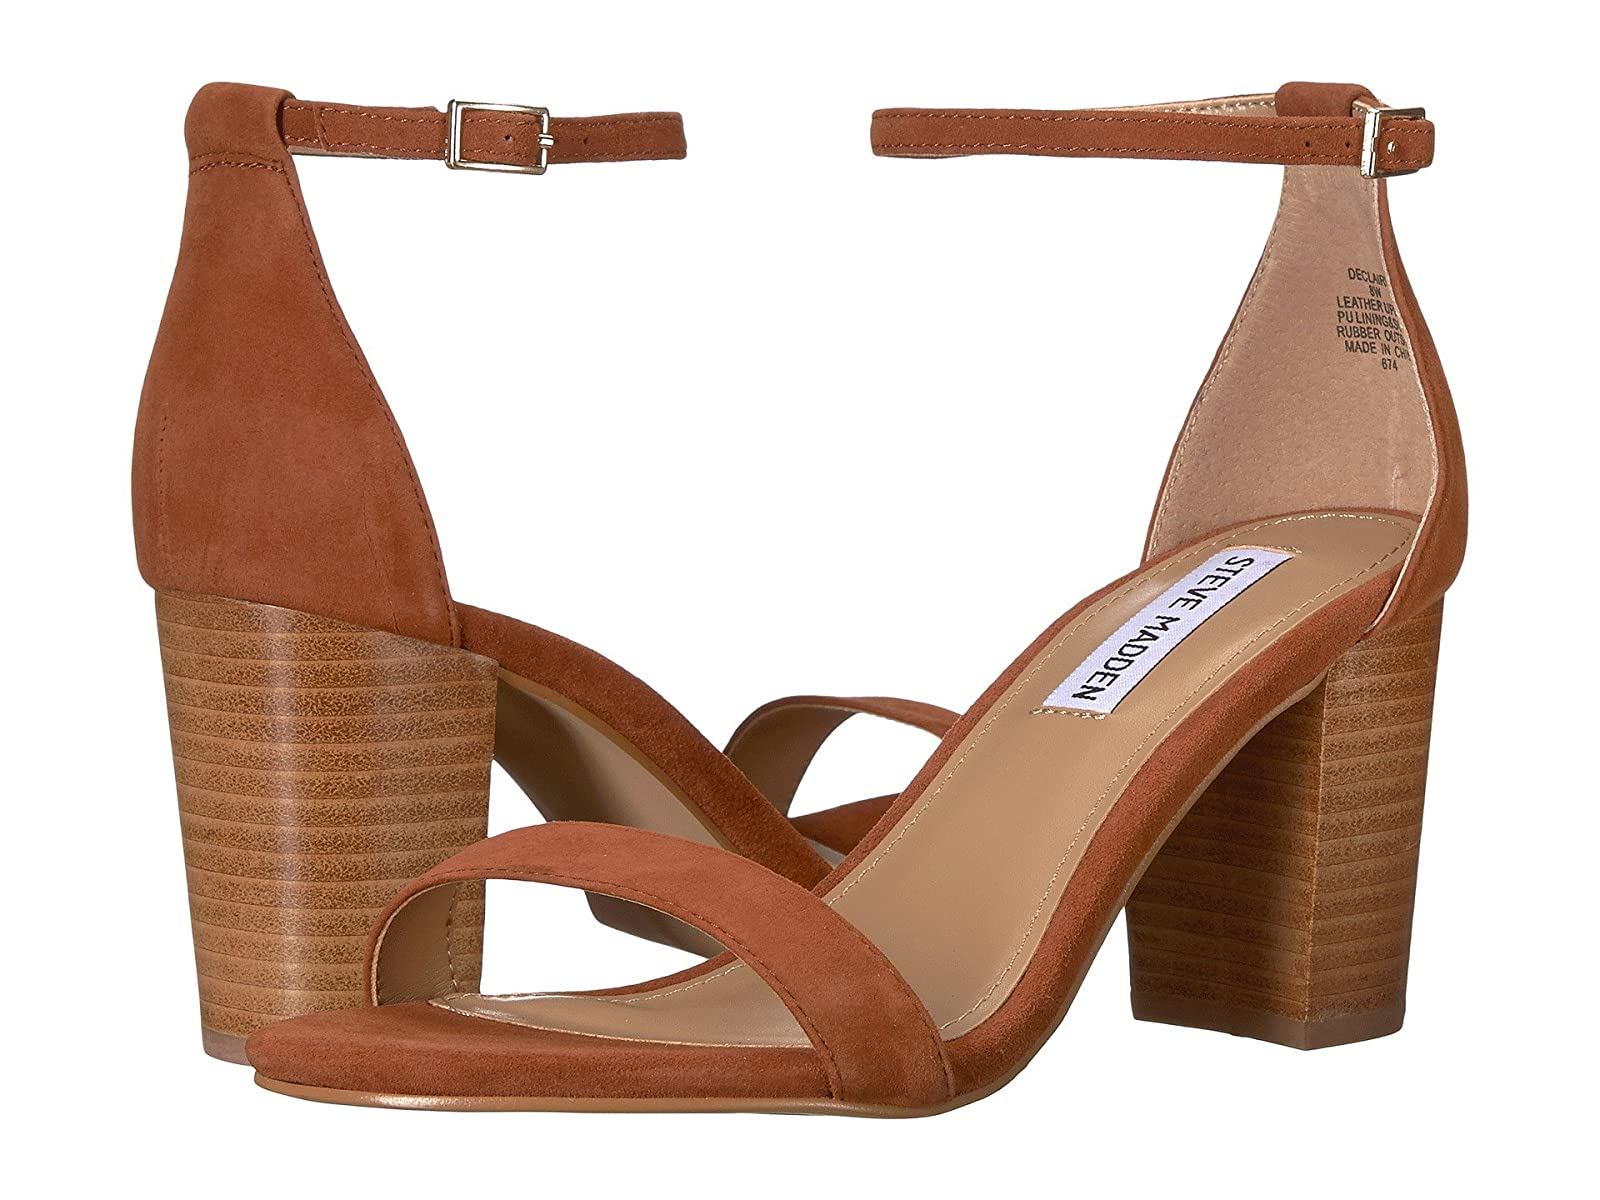 Steve Madden Exclusive - Declair Block Heeled SandalAtmospheric grades have affordable shoes